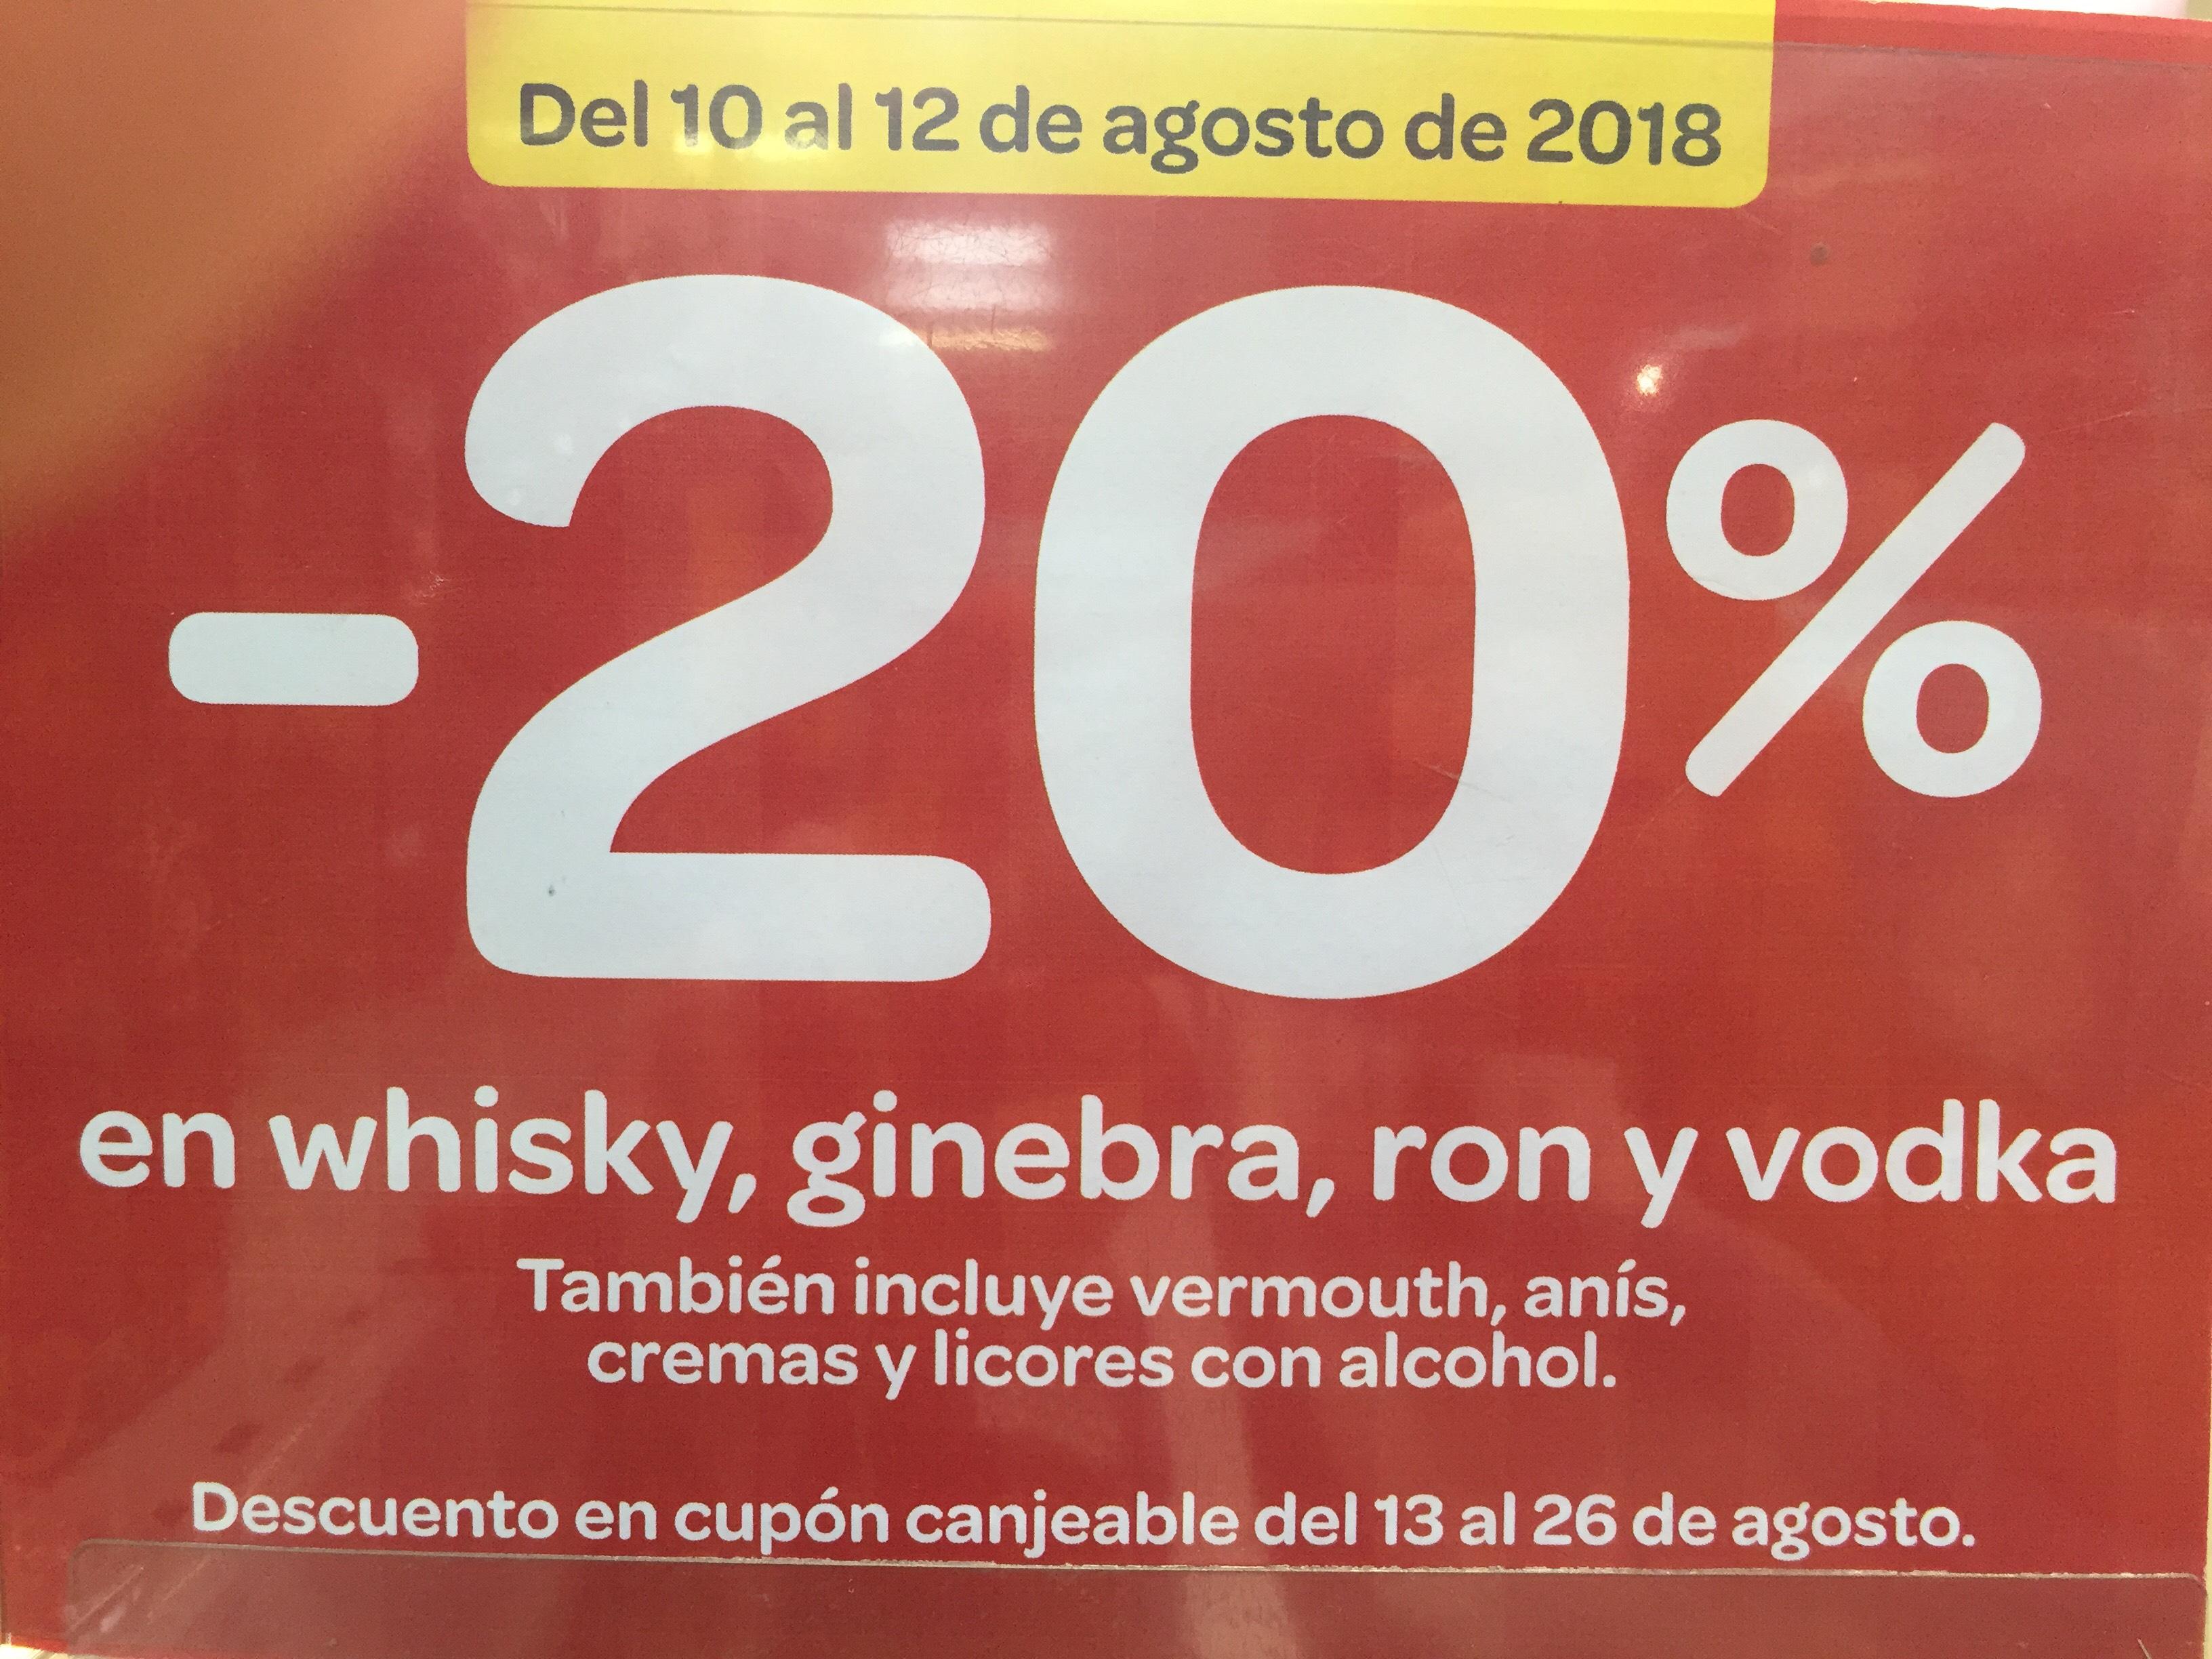 20% Whisky, ginebra, ron y vodka. Chequeahorro